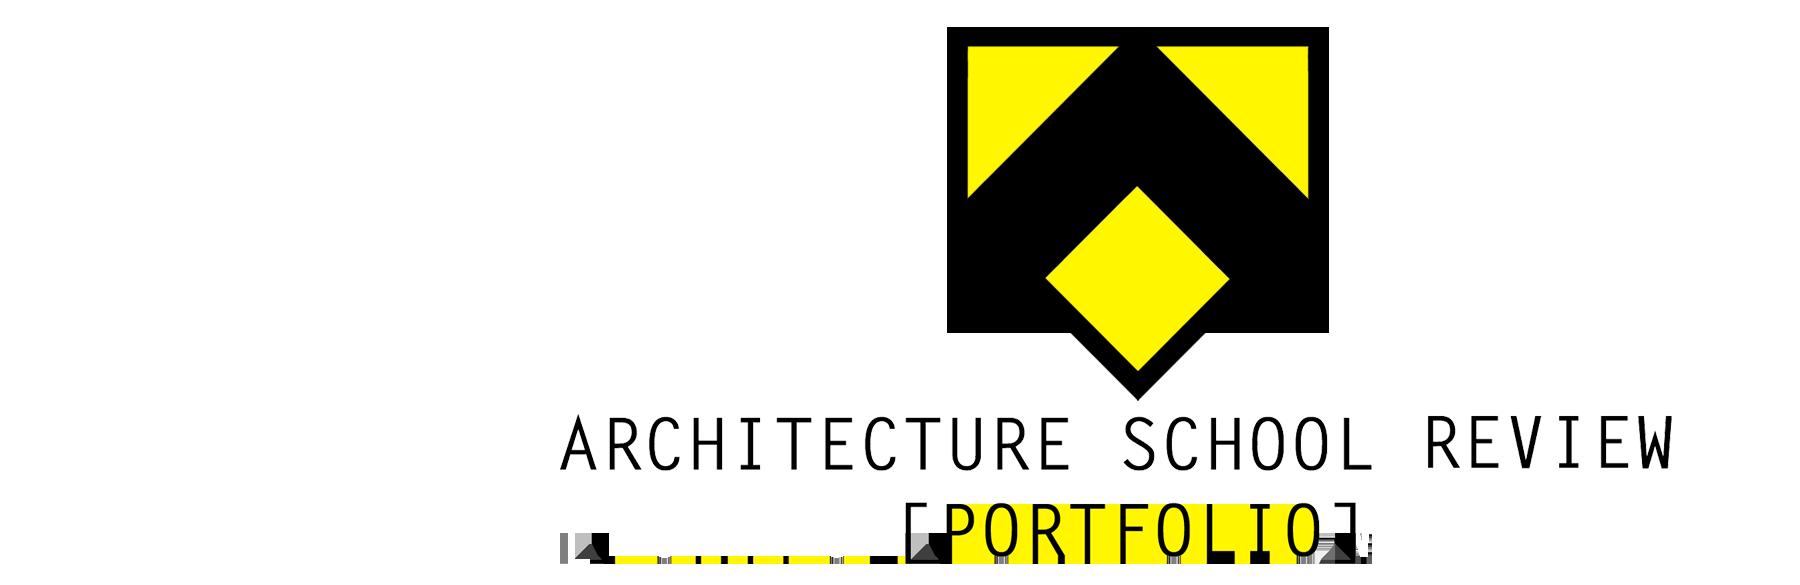 ARCHITECTURE SCHOOL PORTFOLIO REVIEW